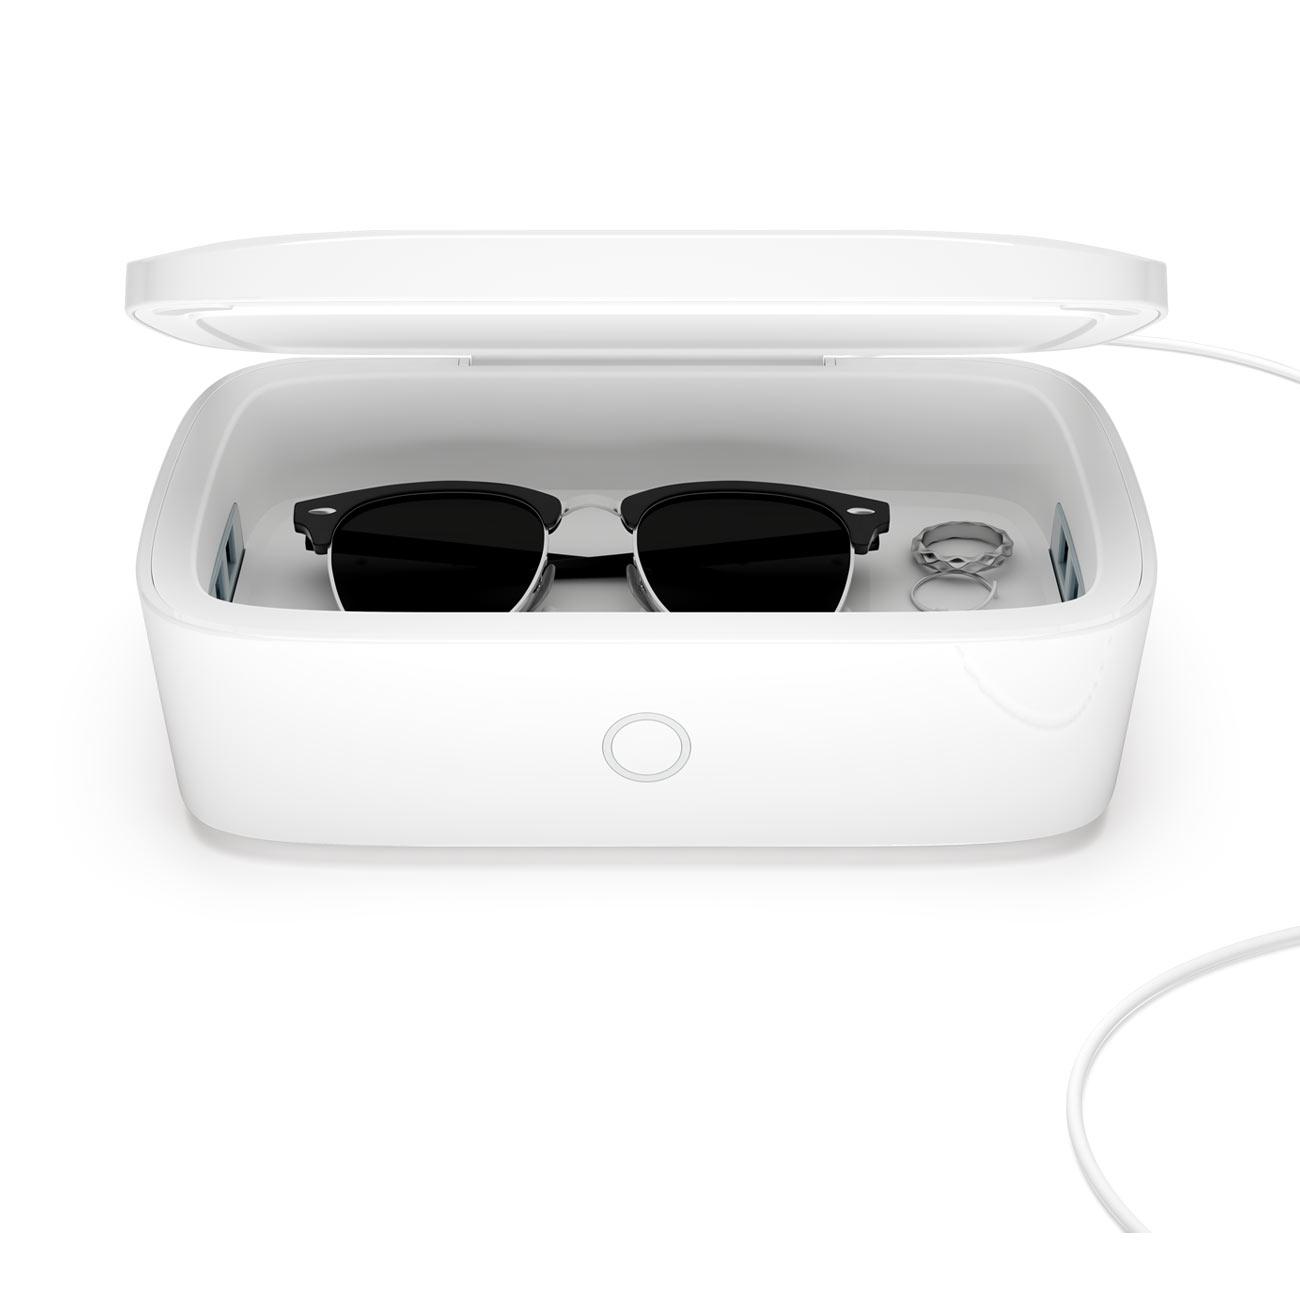 Mundus UV Wireless Charger - Einova